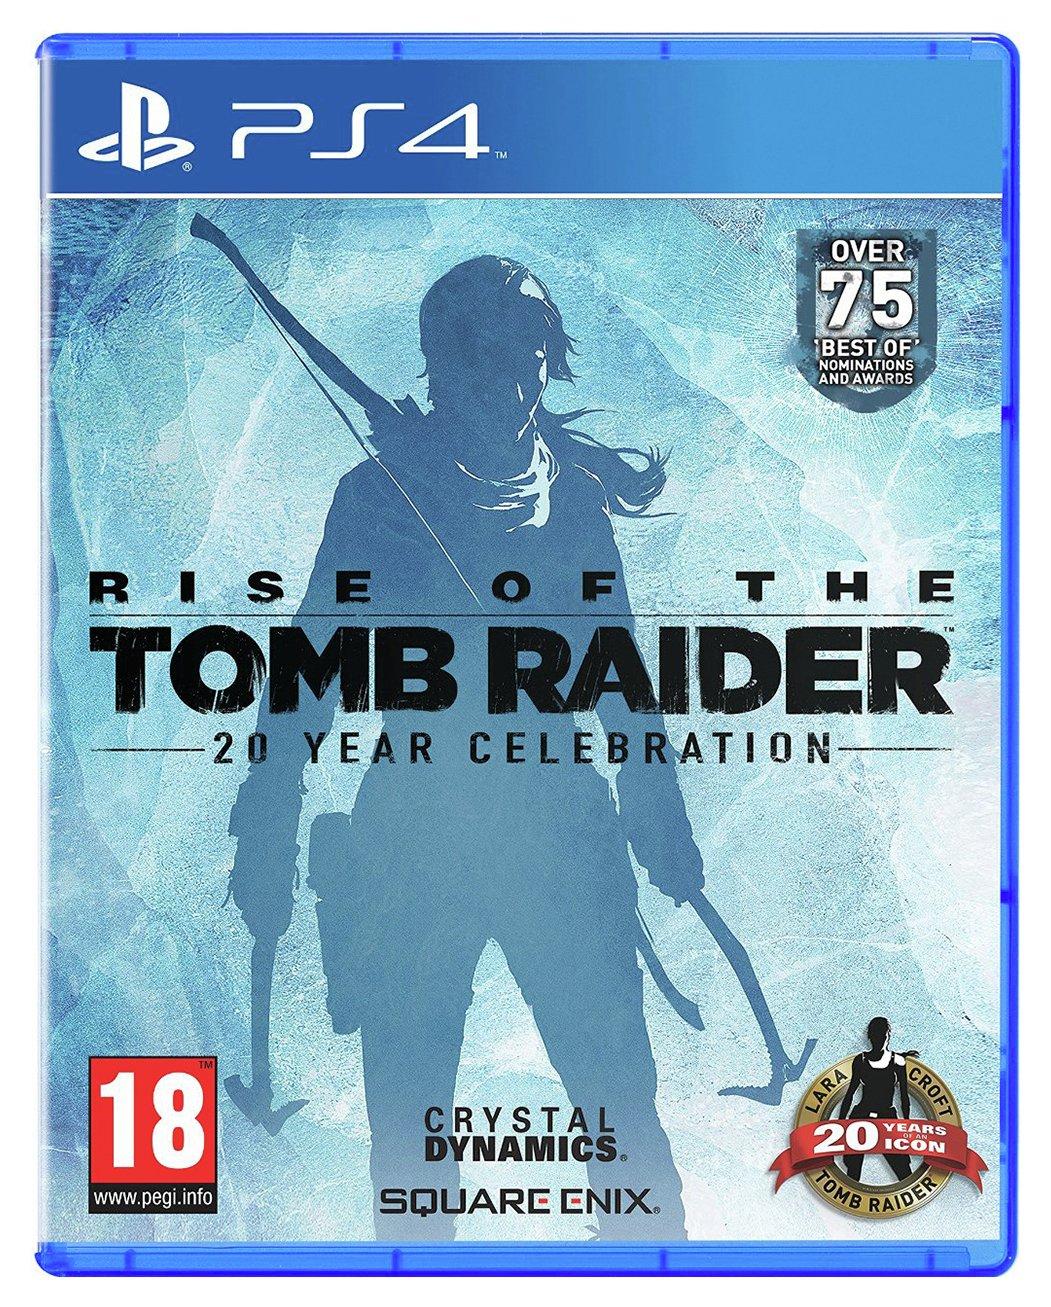 Rise of the Tomb Raider: 20th Anniversary PS4 Game  £11.99  (Prime) / £14.98 (non Prime) at Amazon